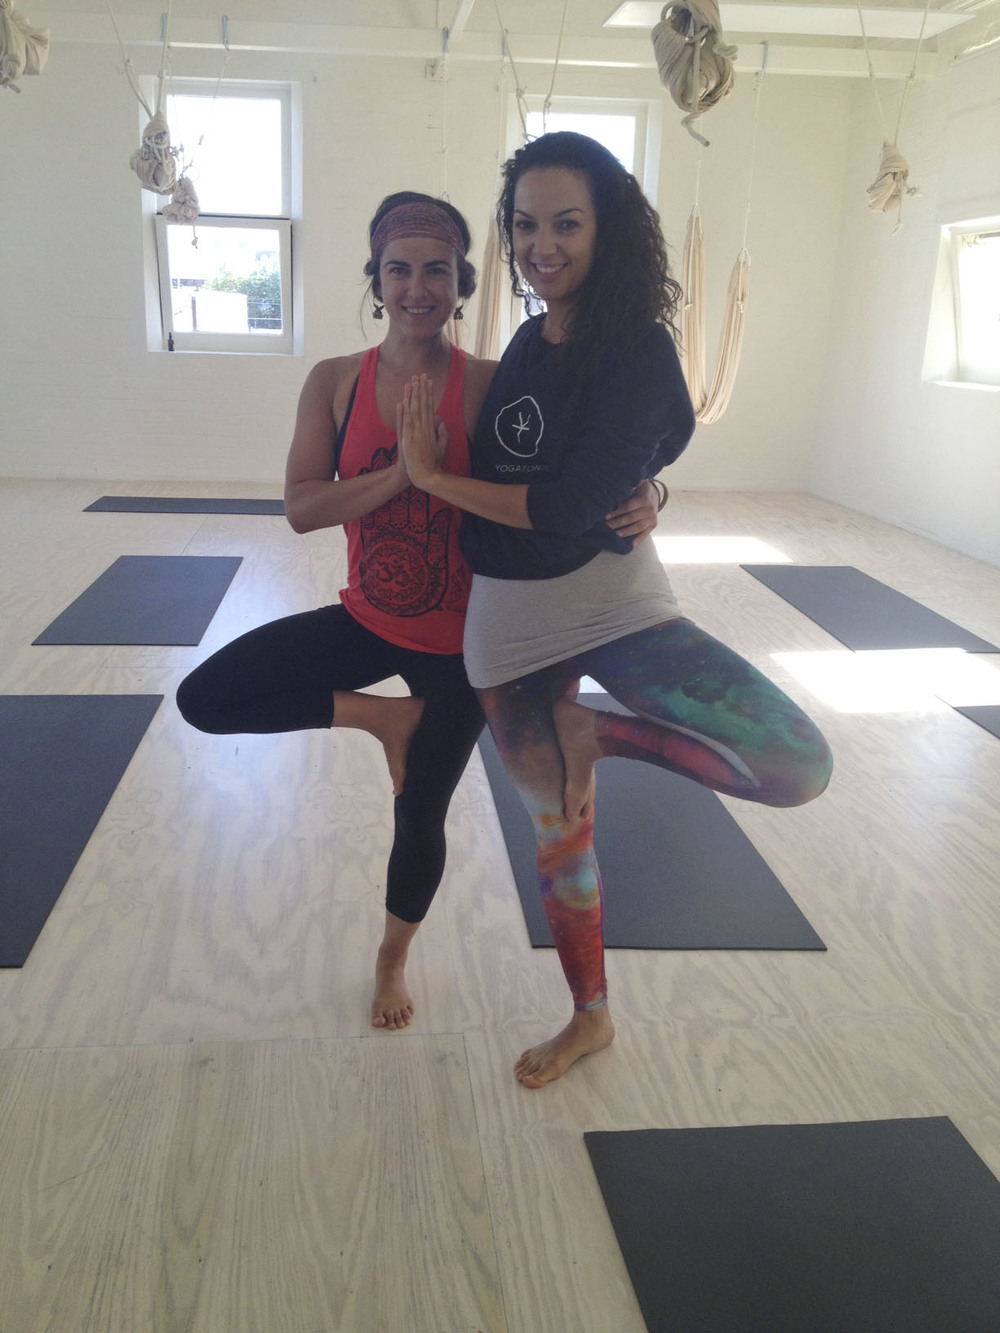 body flow yoga studio melbourne australia2787.jpg